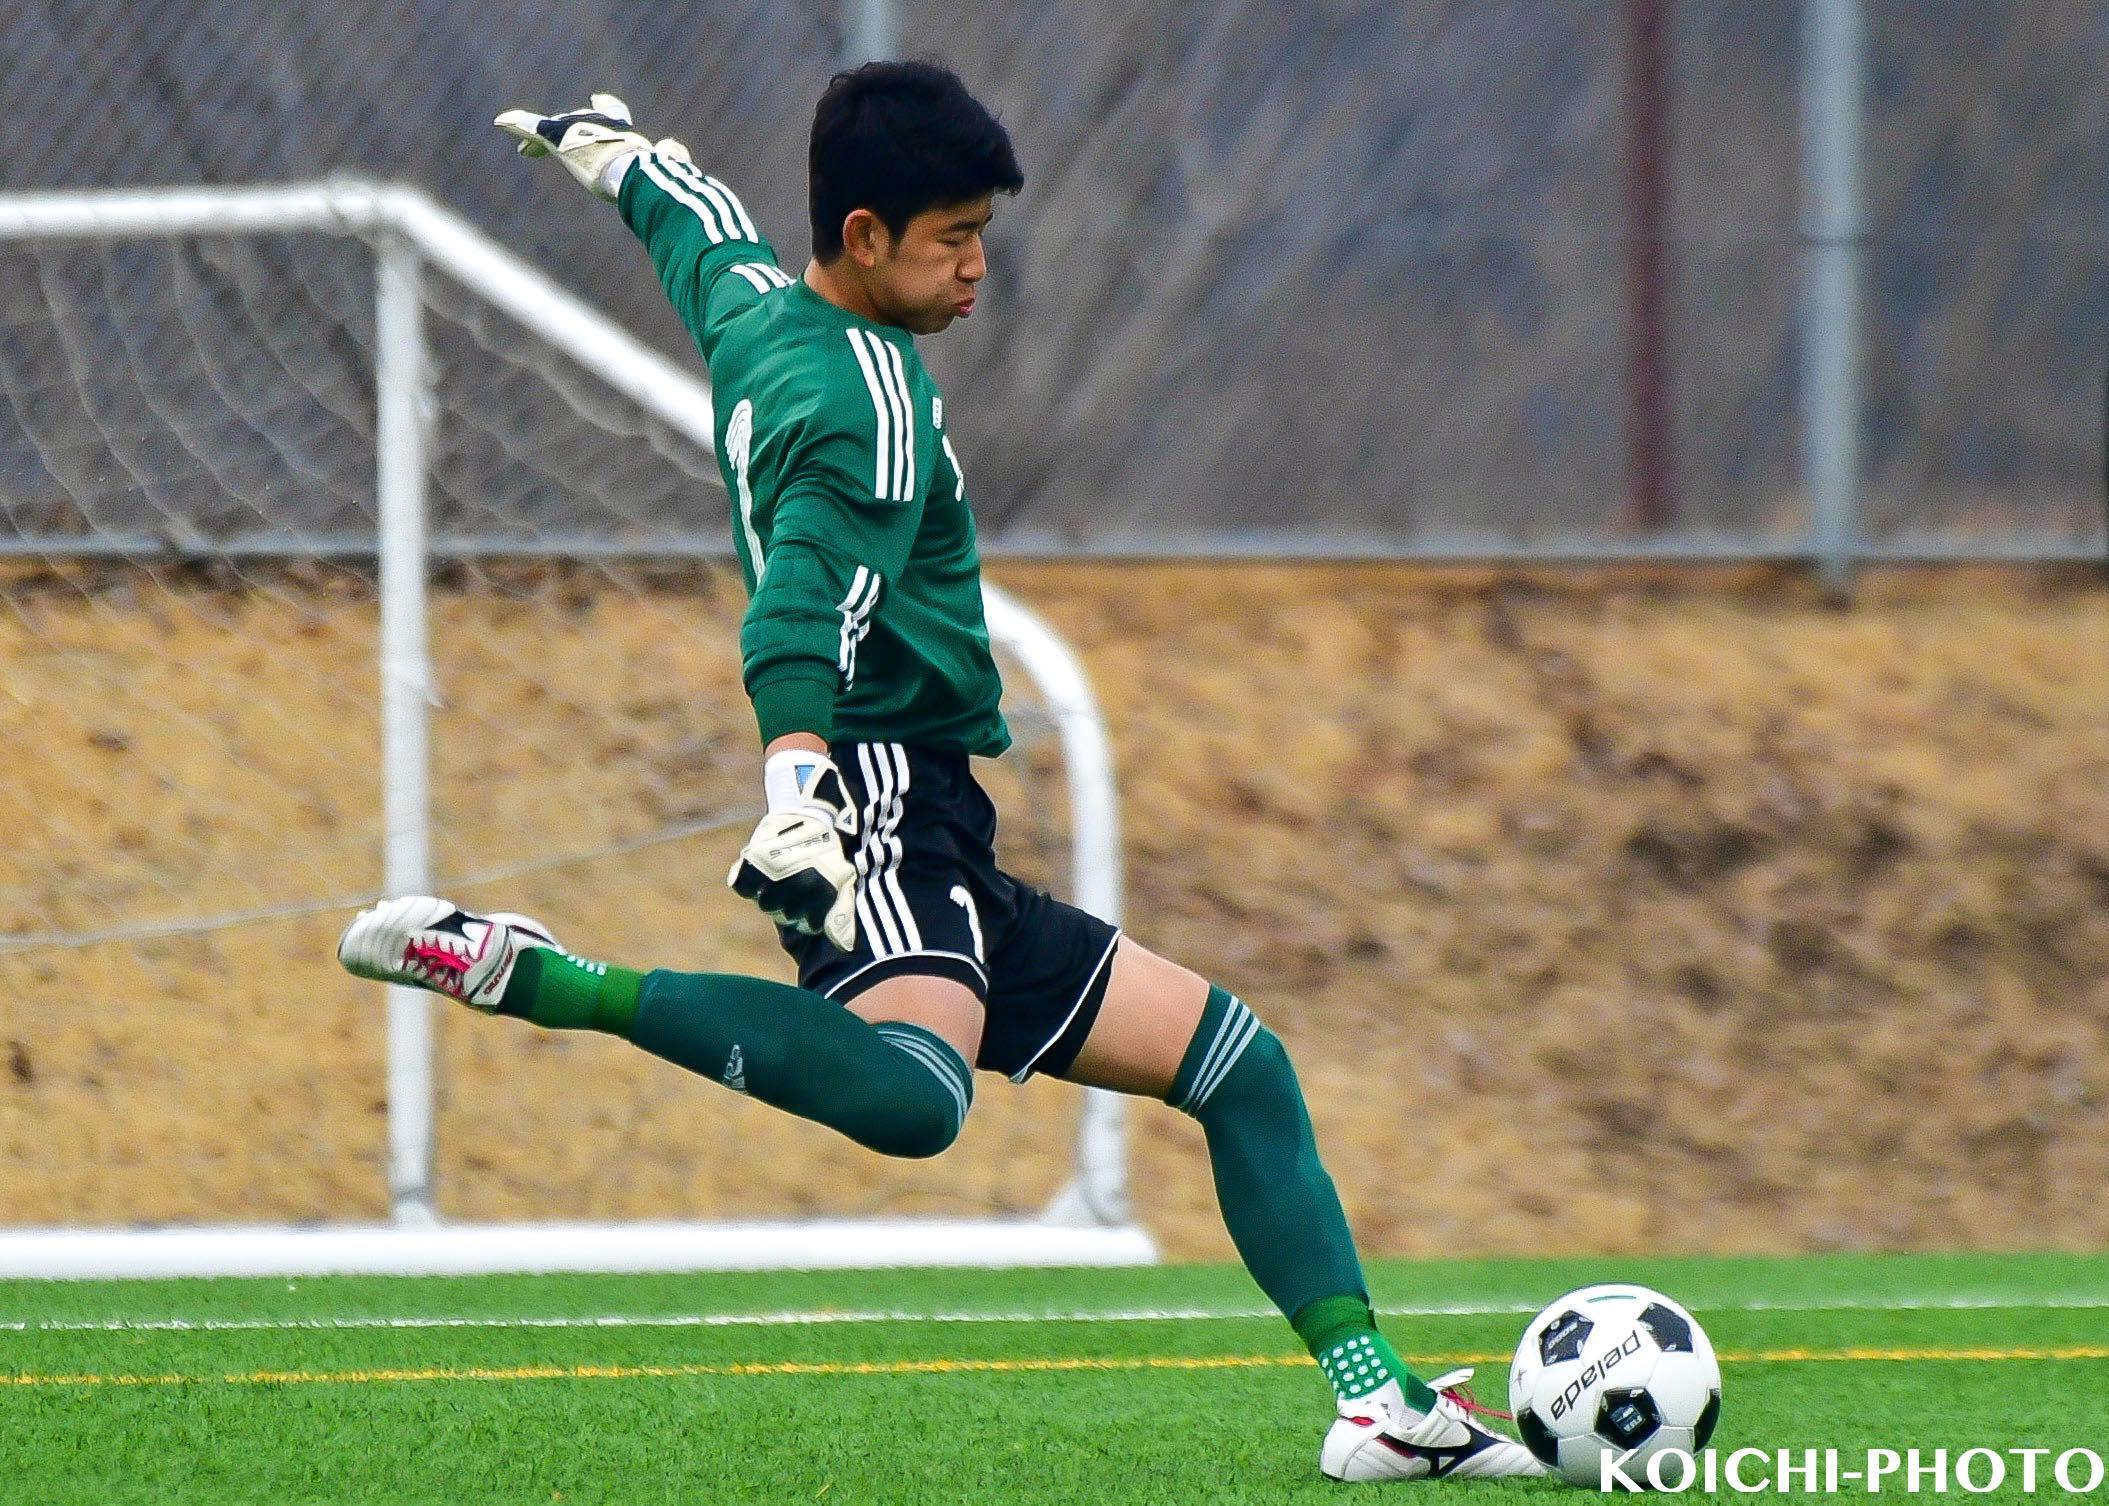 山口 県 高校 サッカー 新人 戦 2021 一般社団法人 山口県サッカー協会